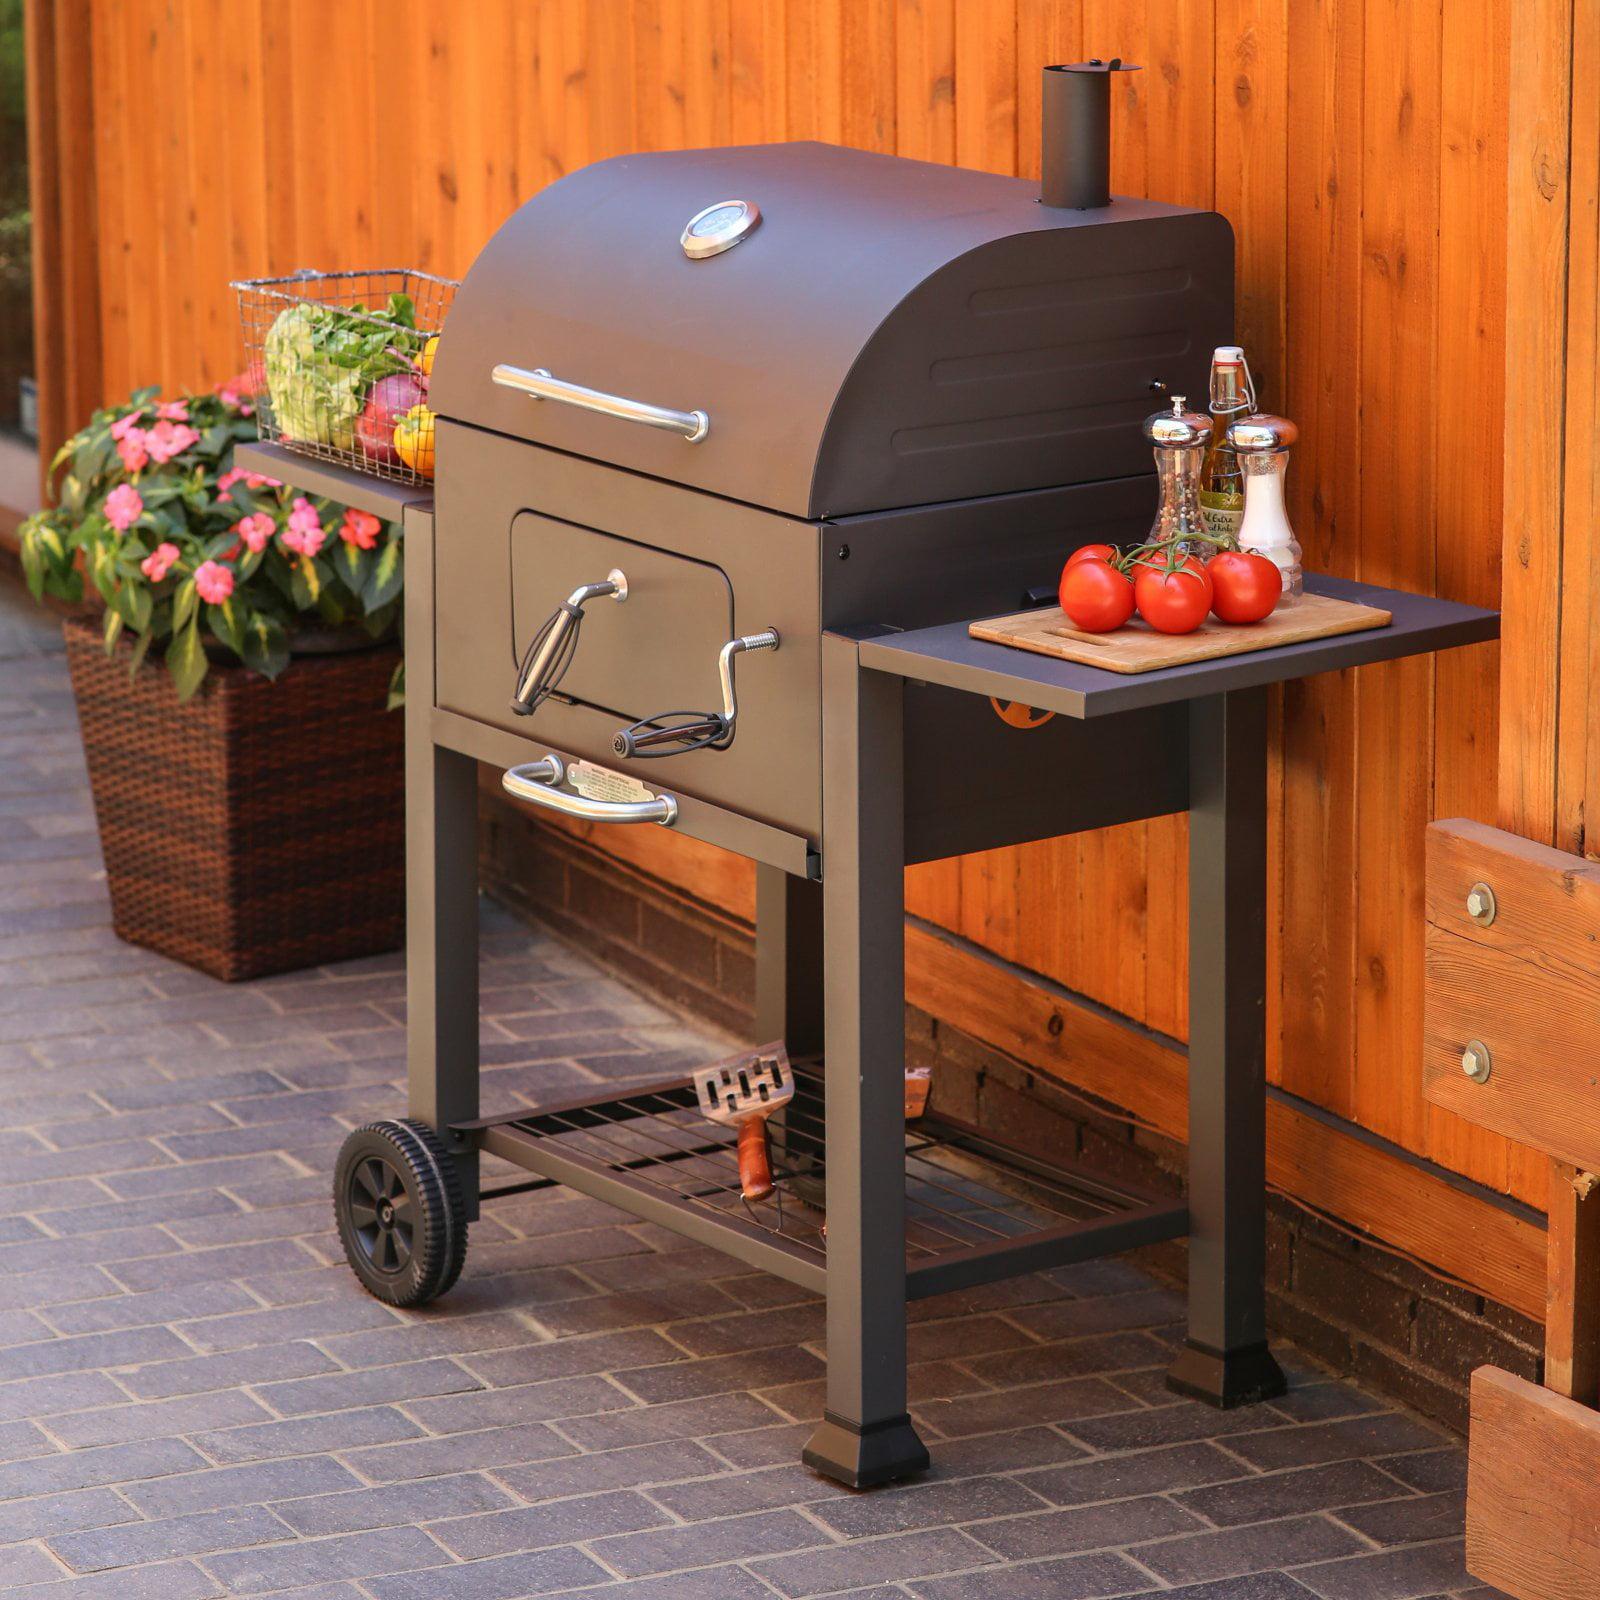 Landmann Vista Barbecue Charcoal Grill by Landmann